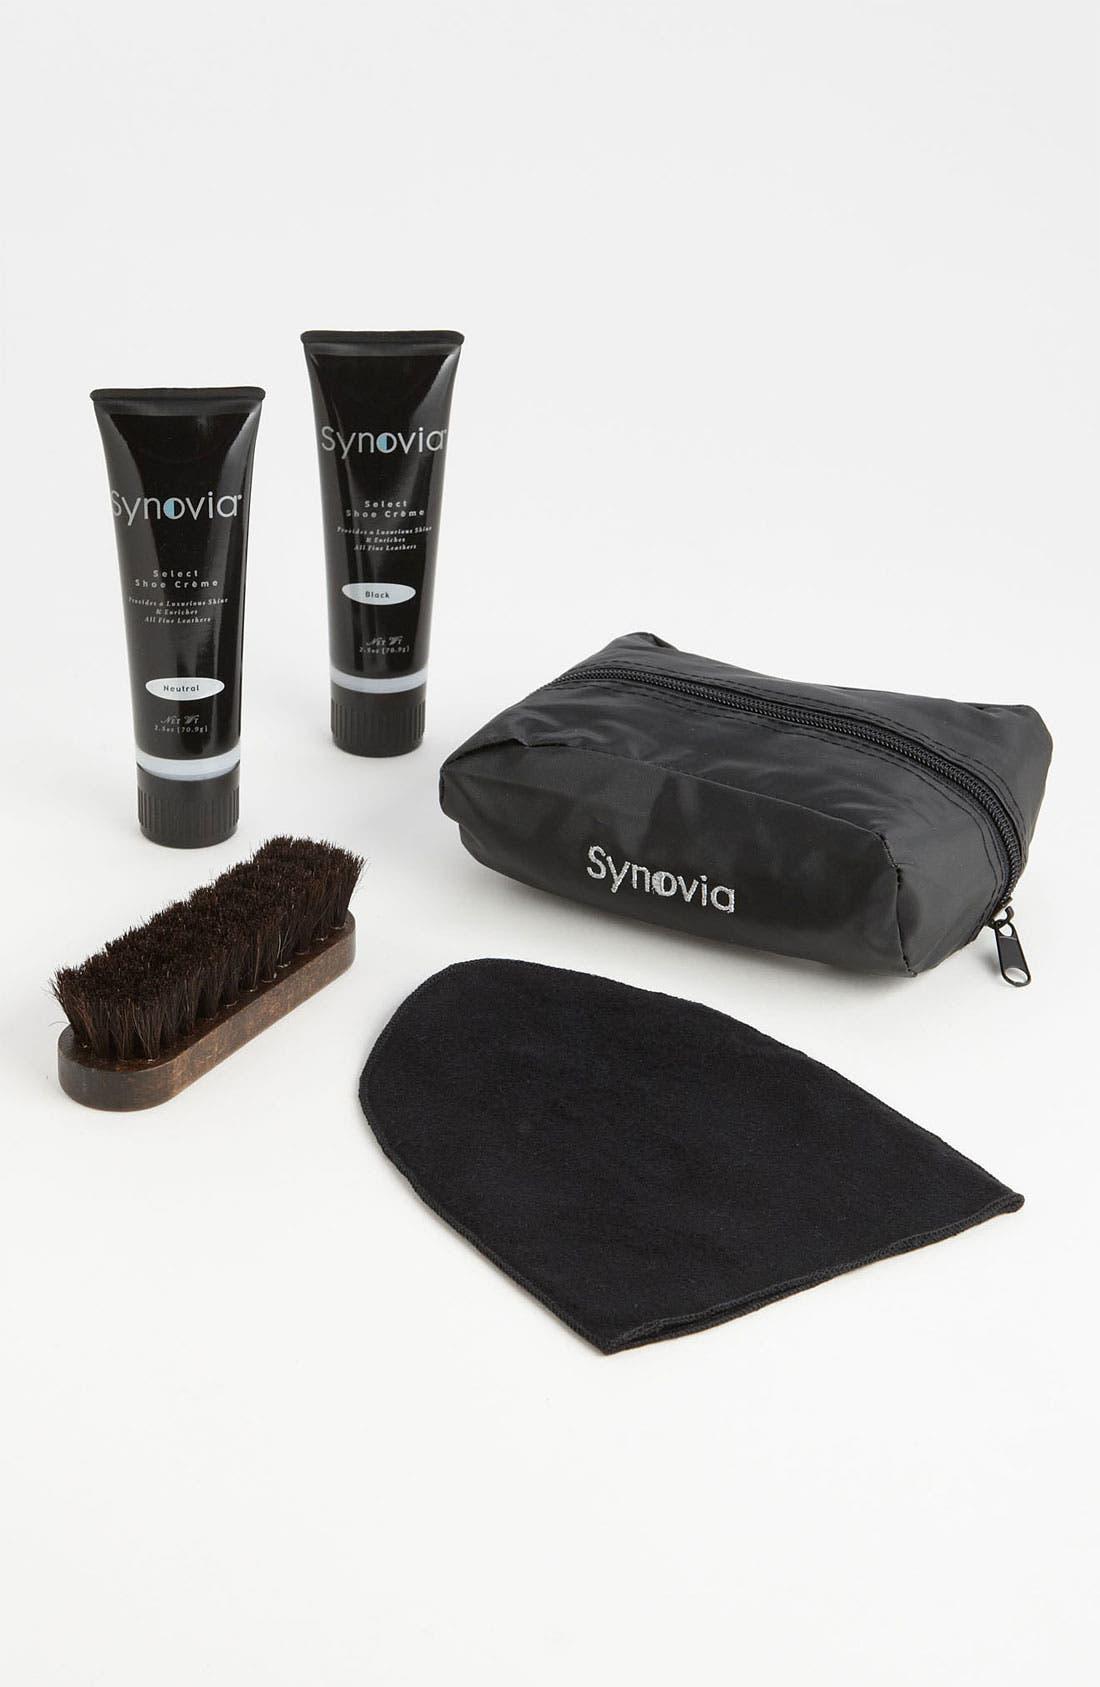 Synovia Shoe Care Kit